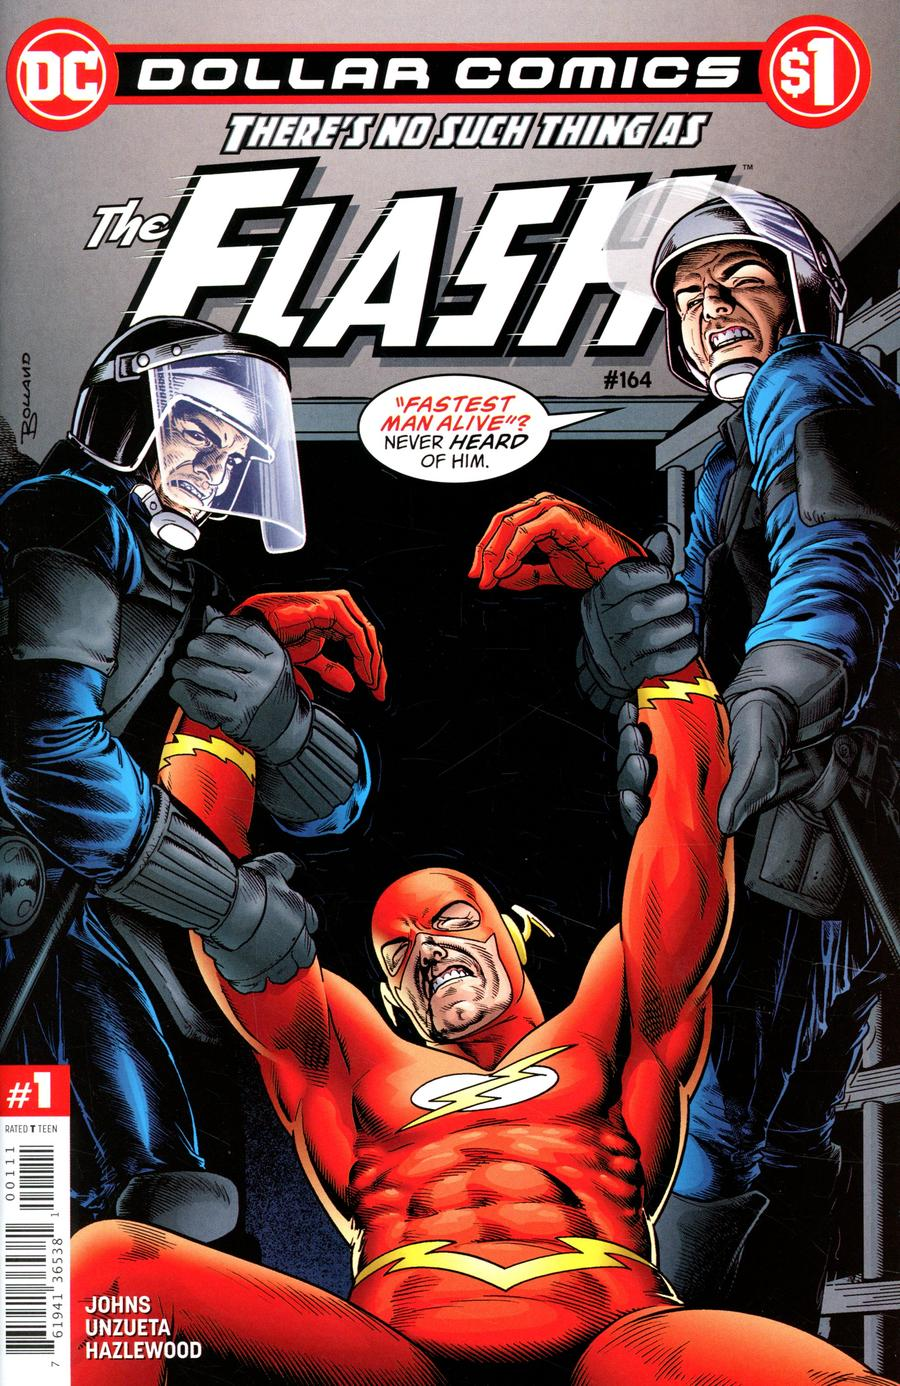 Dollar Comics Flash #164